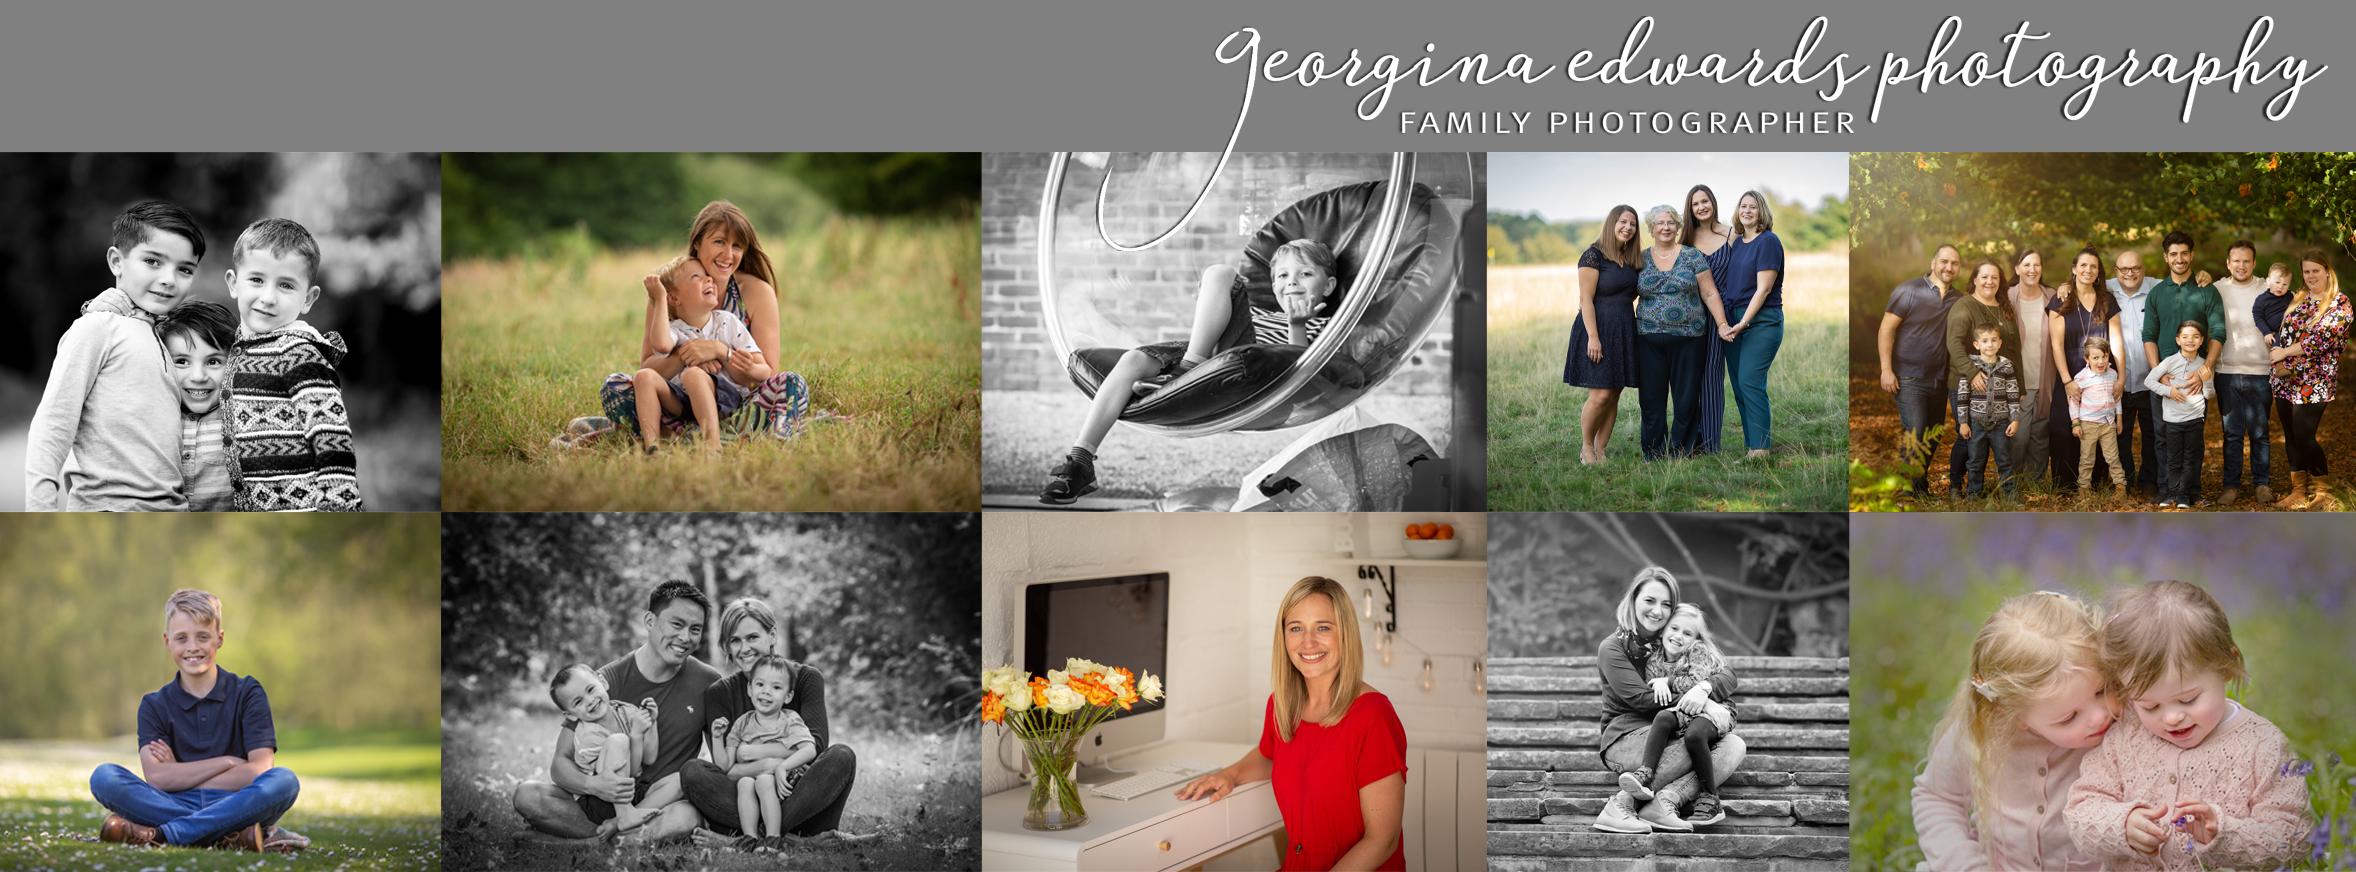 Georgina Edwards Photography